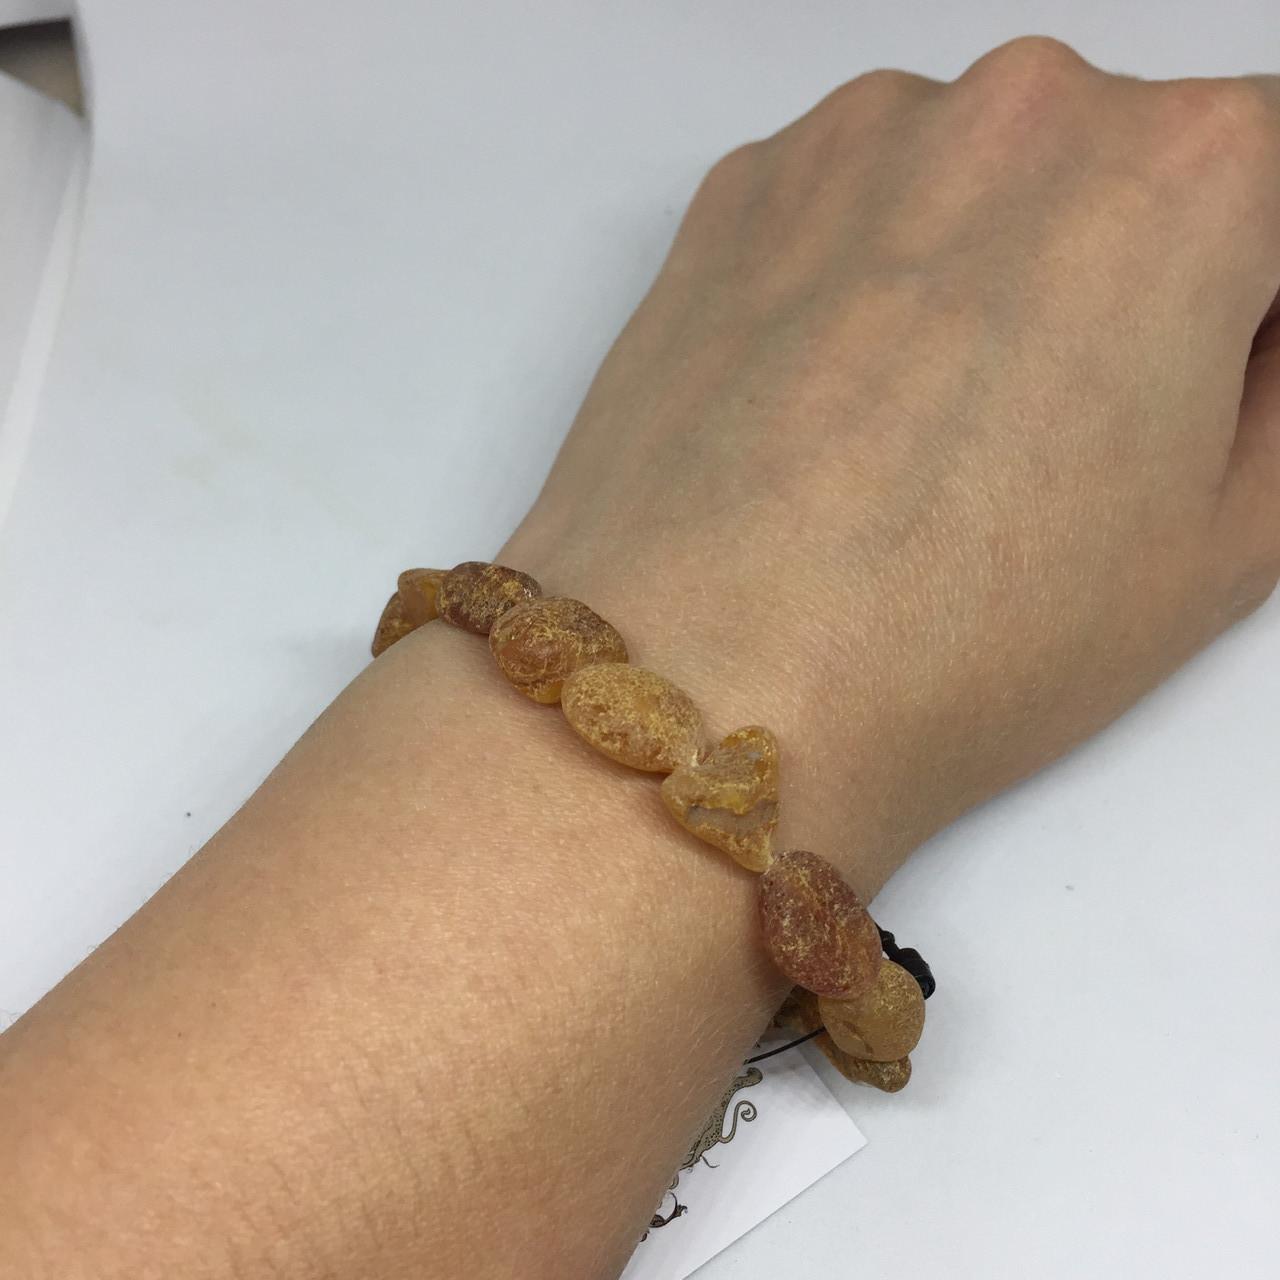 Янтарь браслет натуральный лечебный янтарь браслет с янтарем на резинке Украина